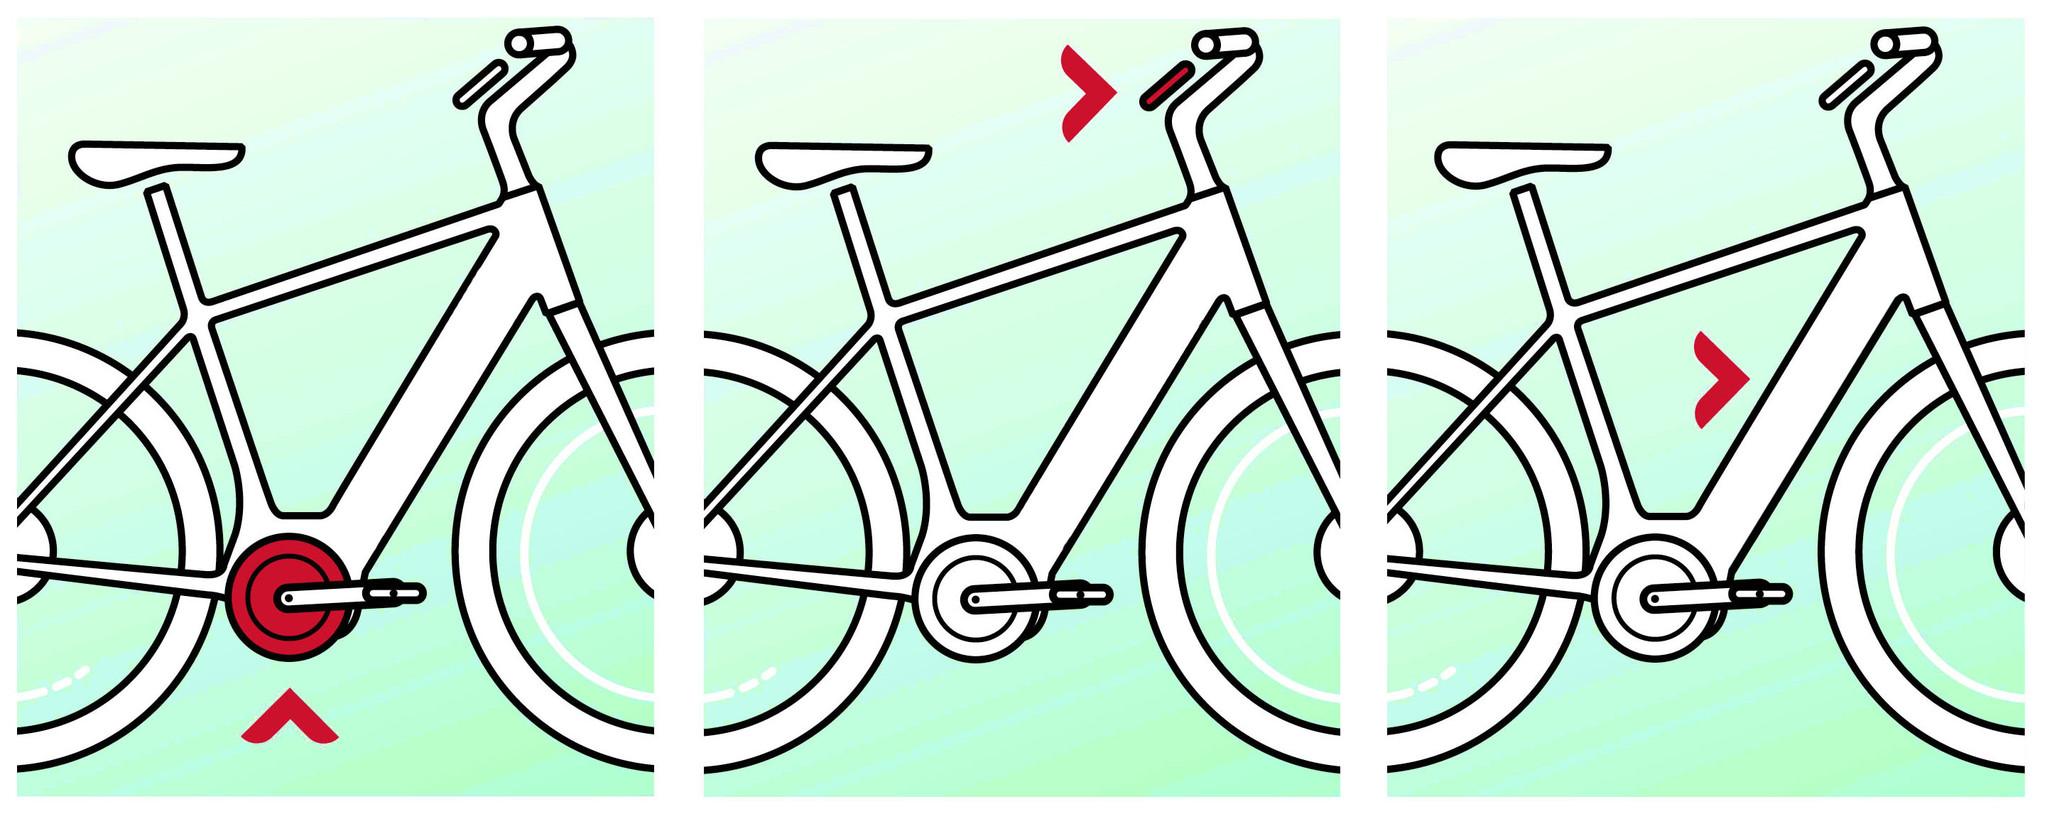 E-bike anatomy